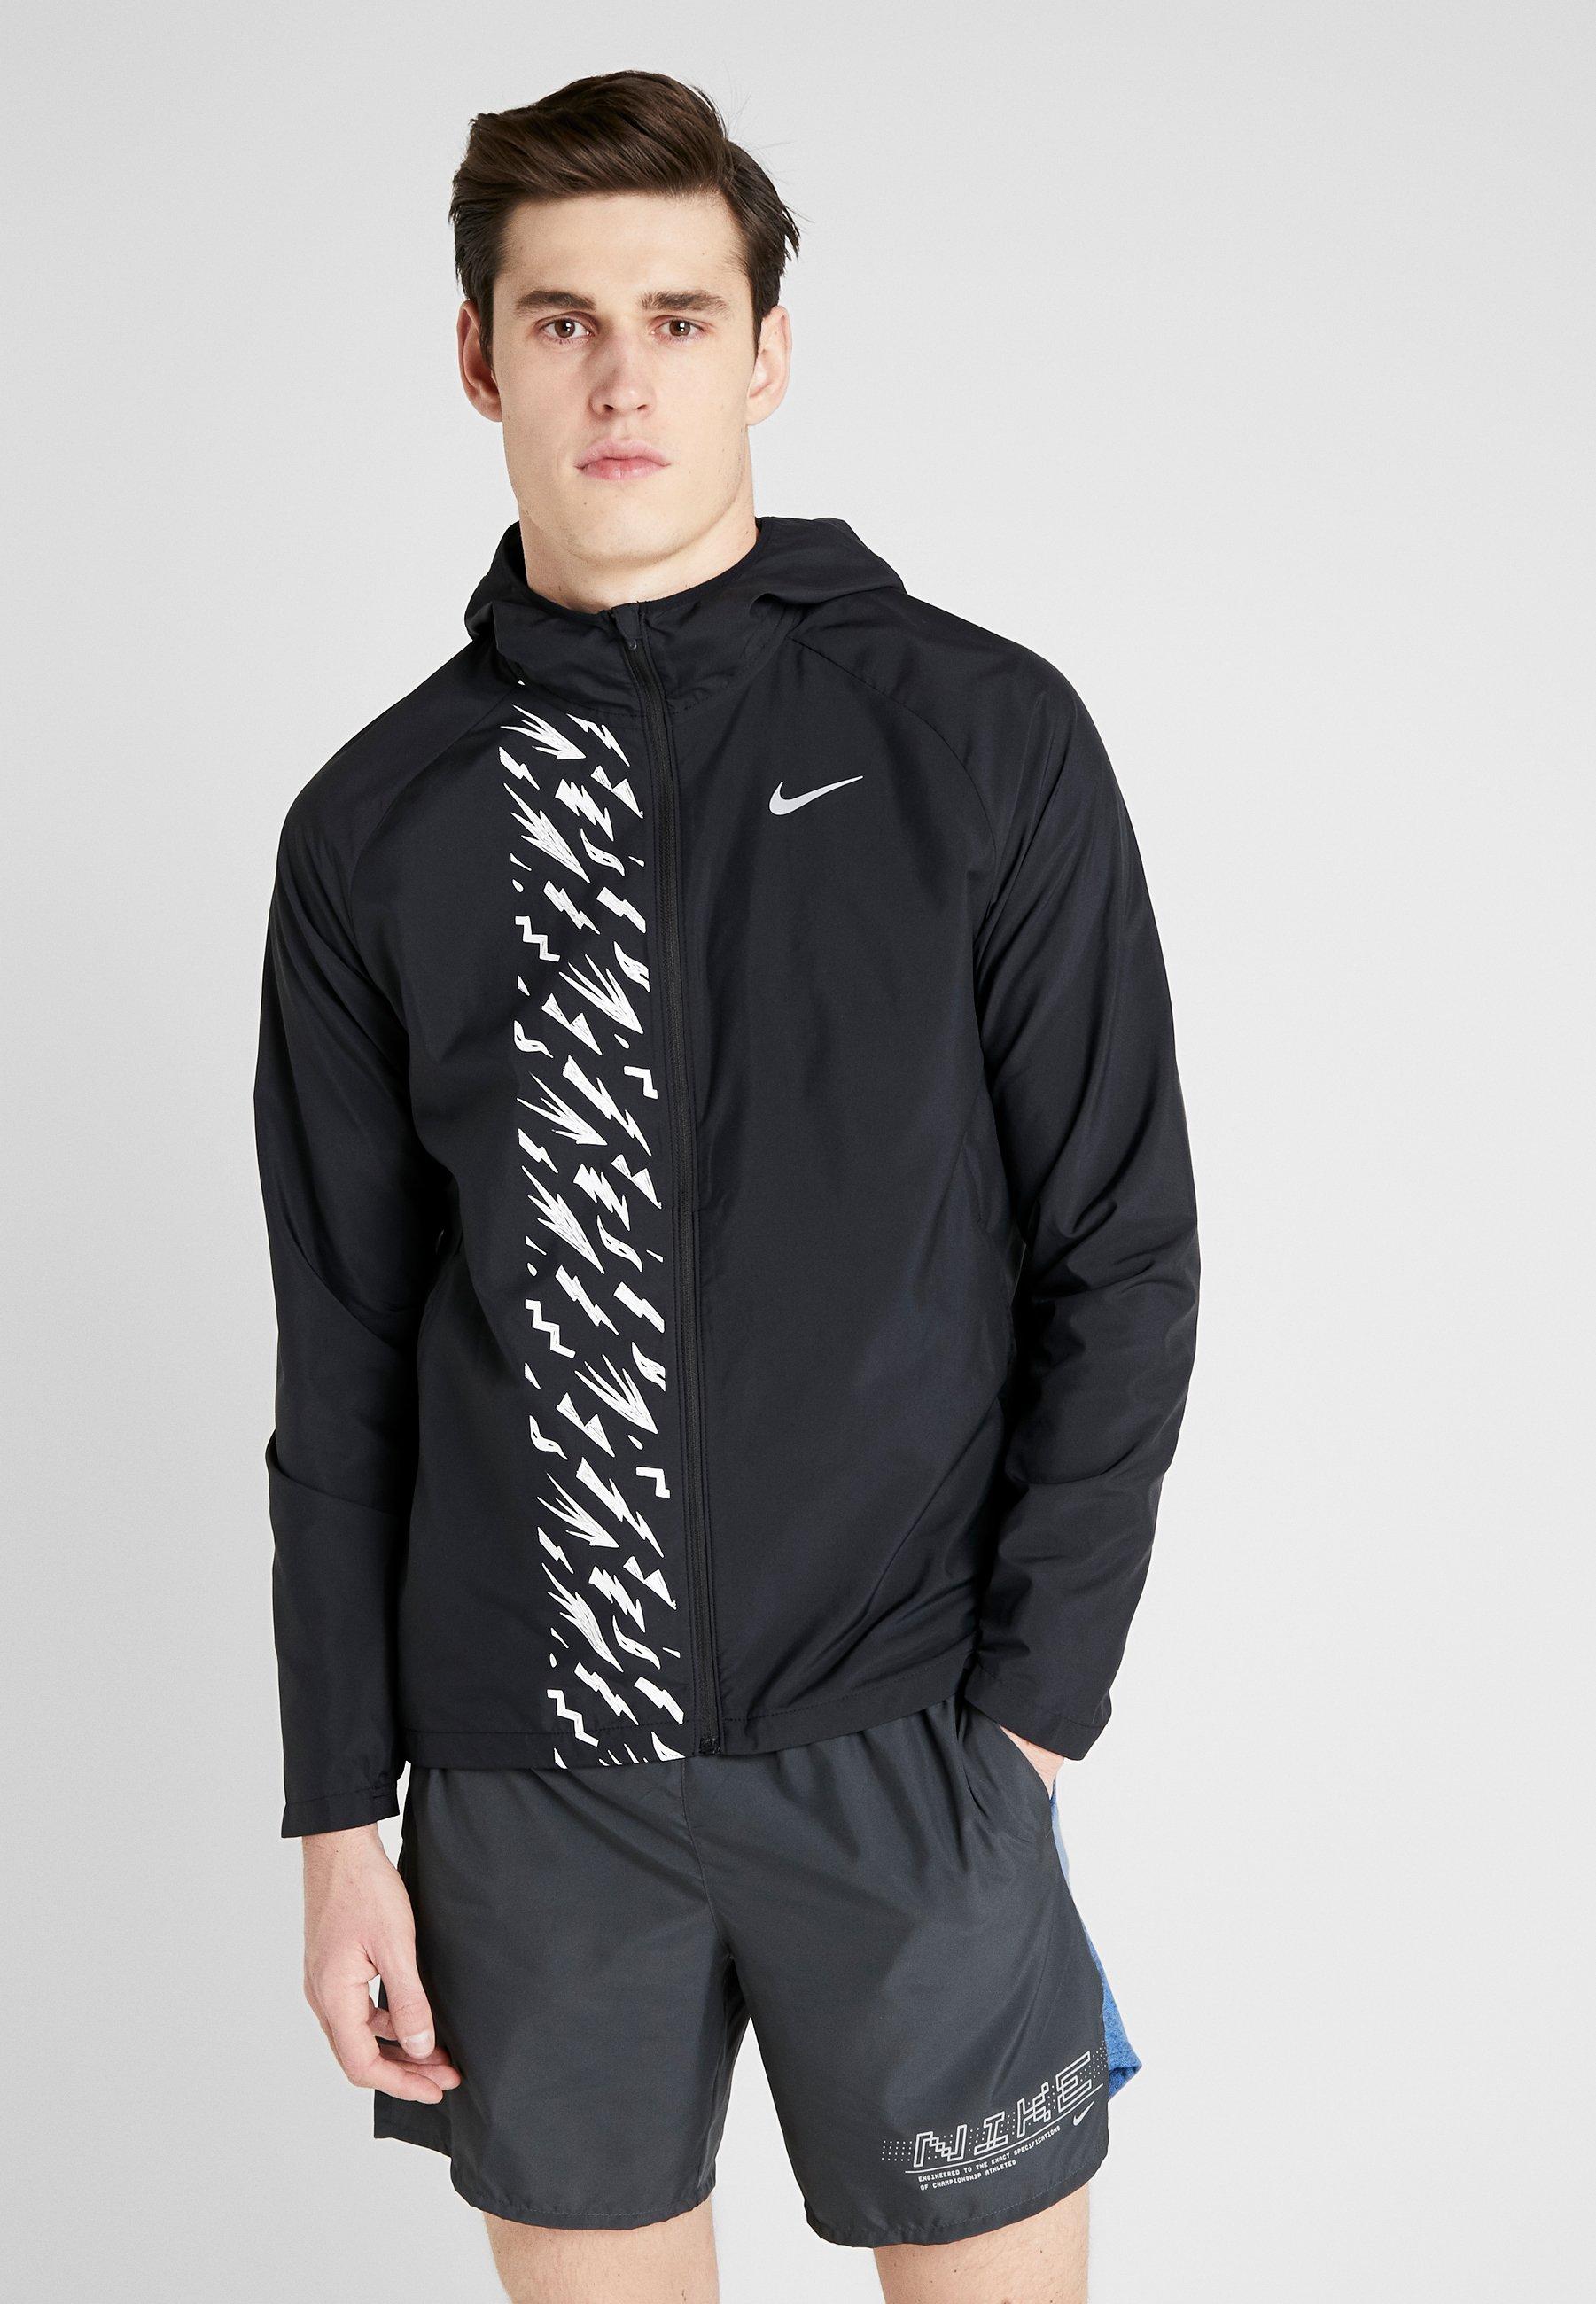 Tukkulaatu Miesten vaatteet Sarja dfKJIUp97454sfGHYHD Nike Performance Juoksutakki black/reflective silver